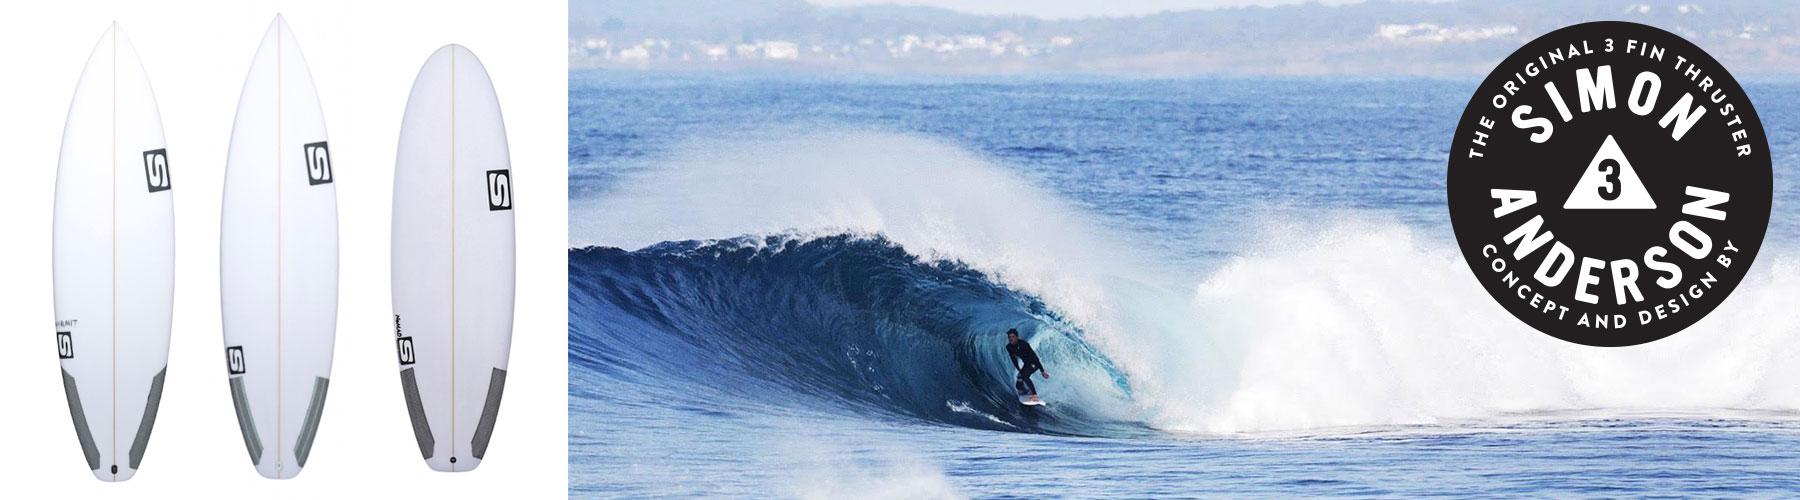 Simon Anderson Surfboards Western Australia